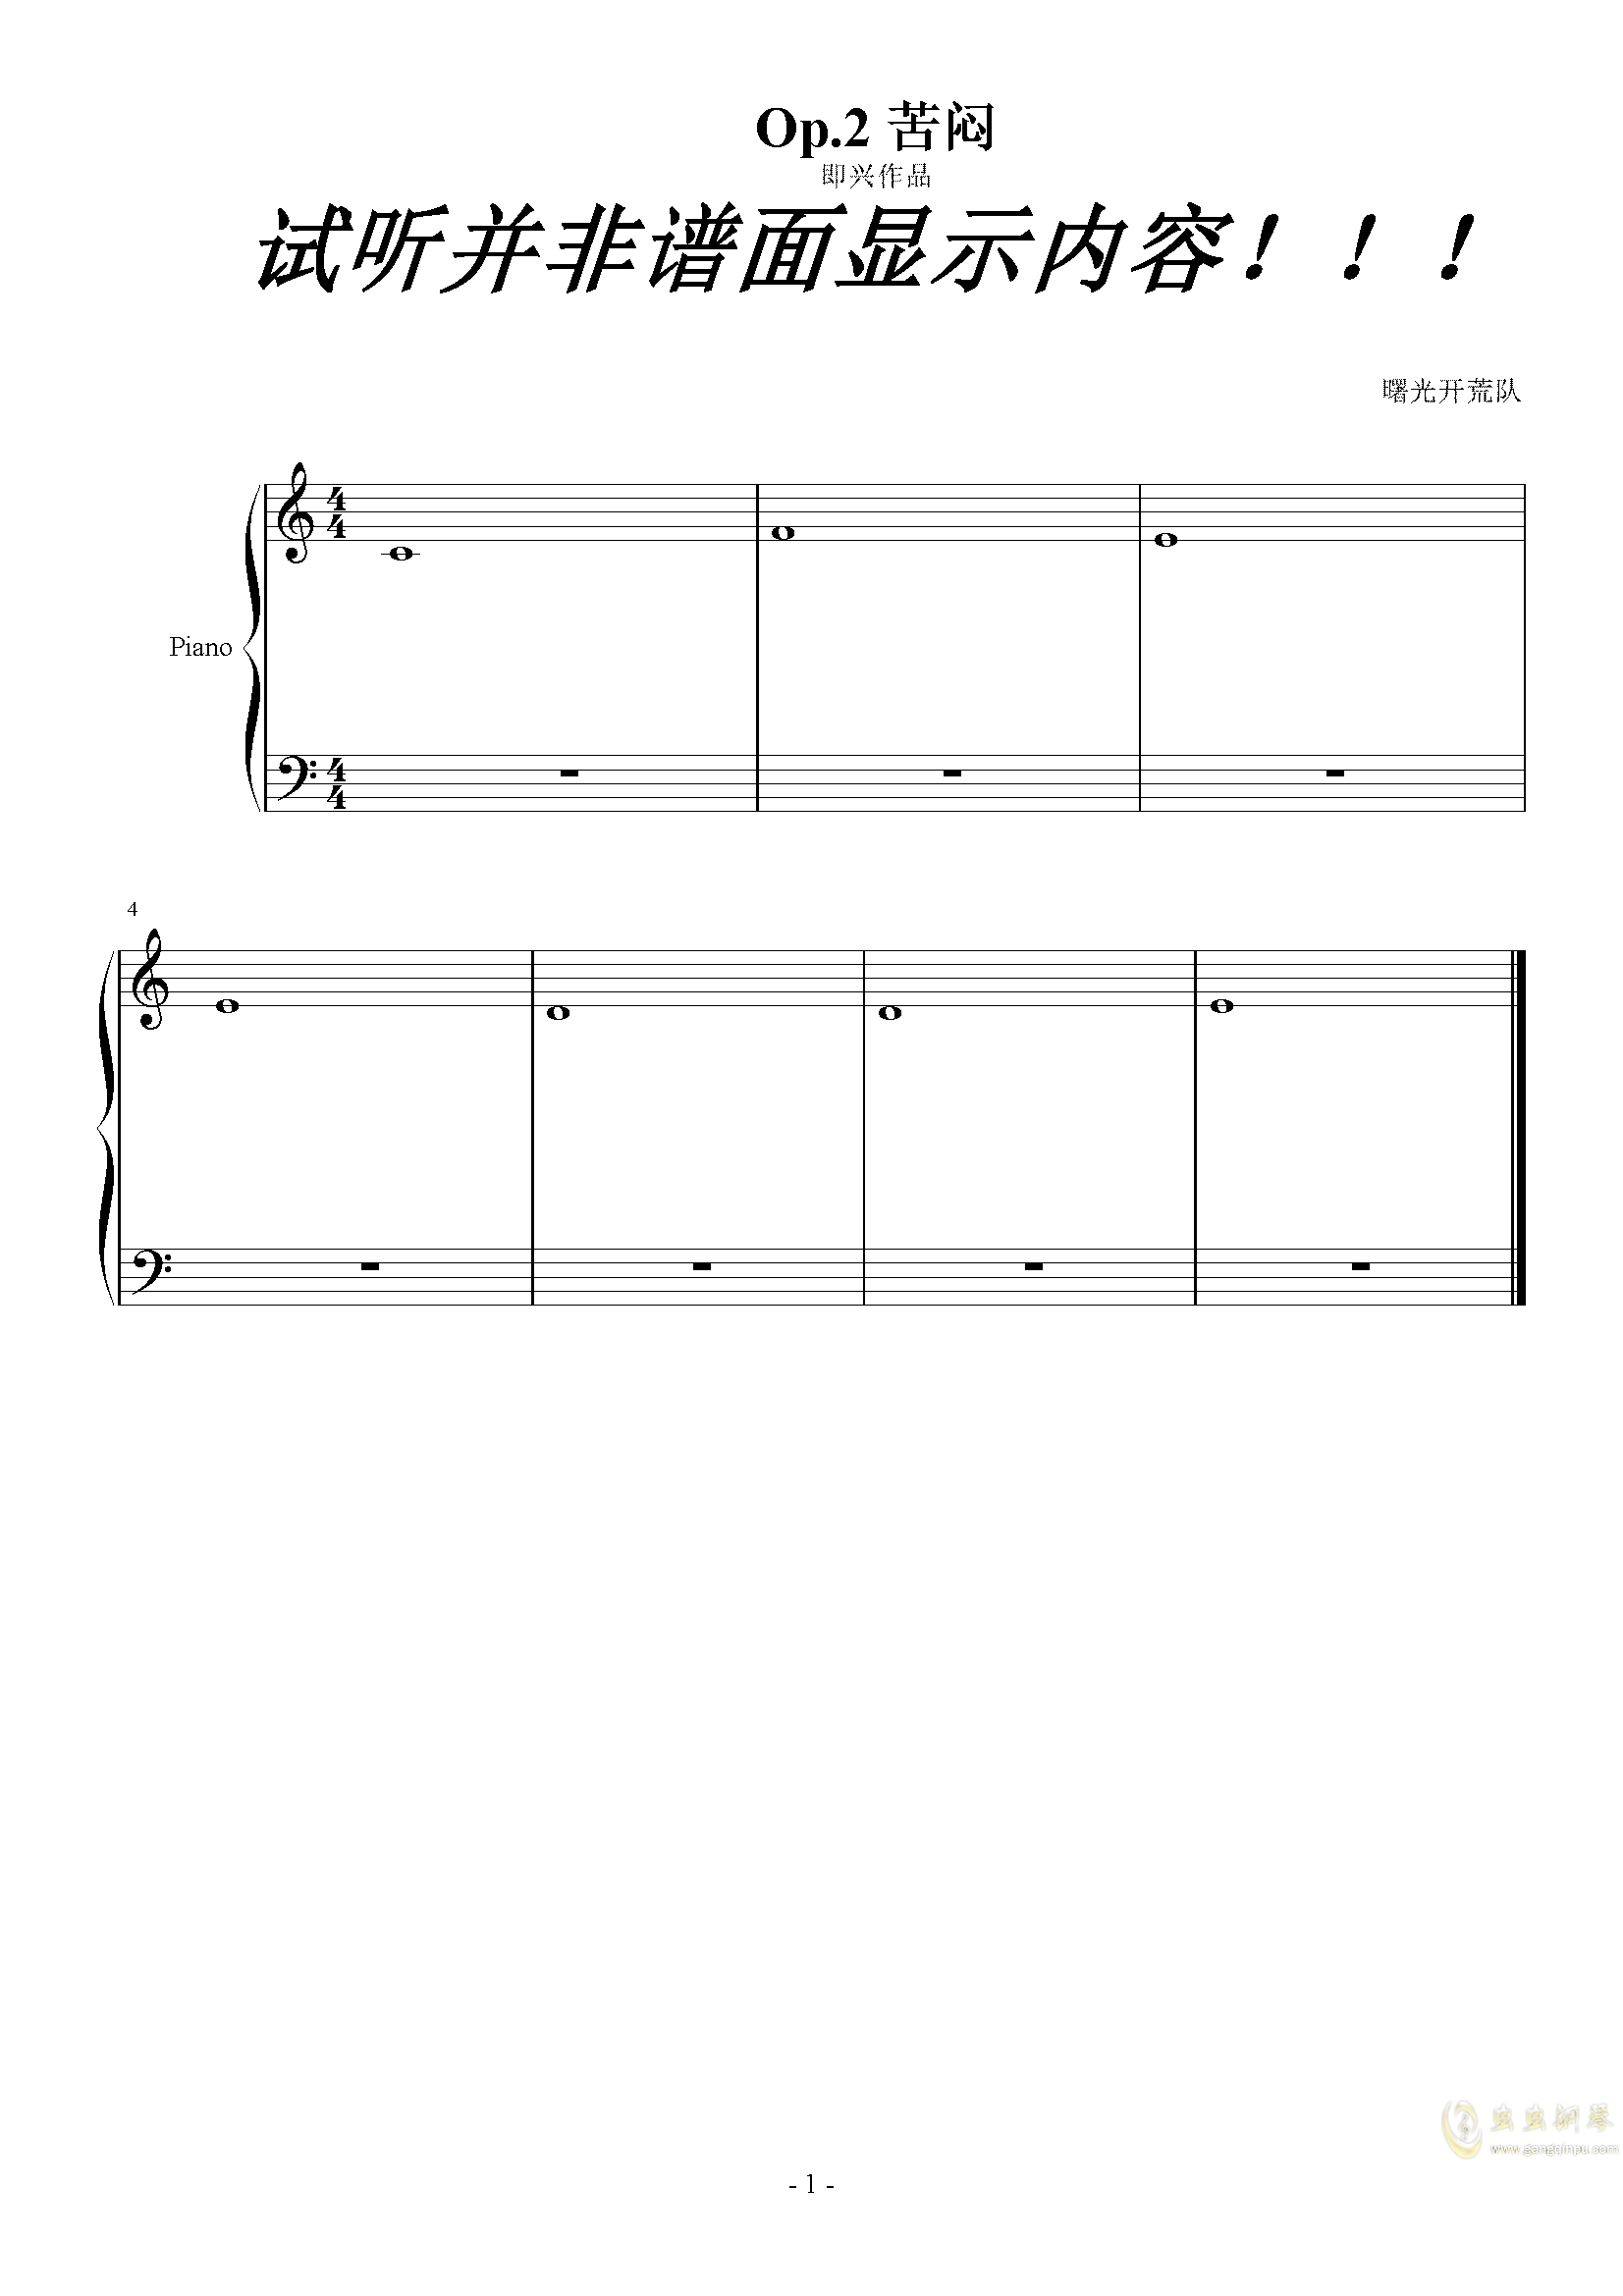 Op.2 即兴作品-苦闷澳门星际官网 第1页